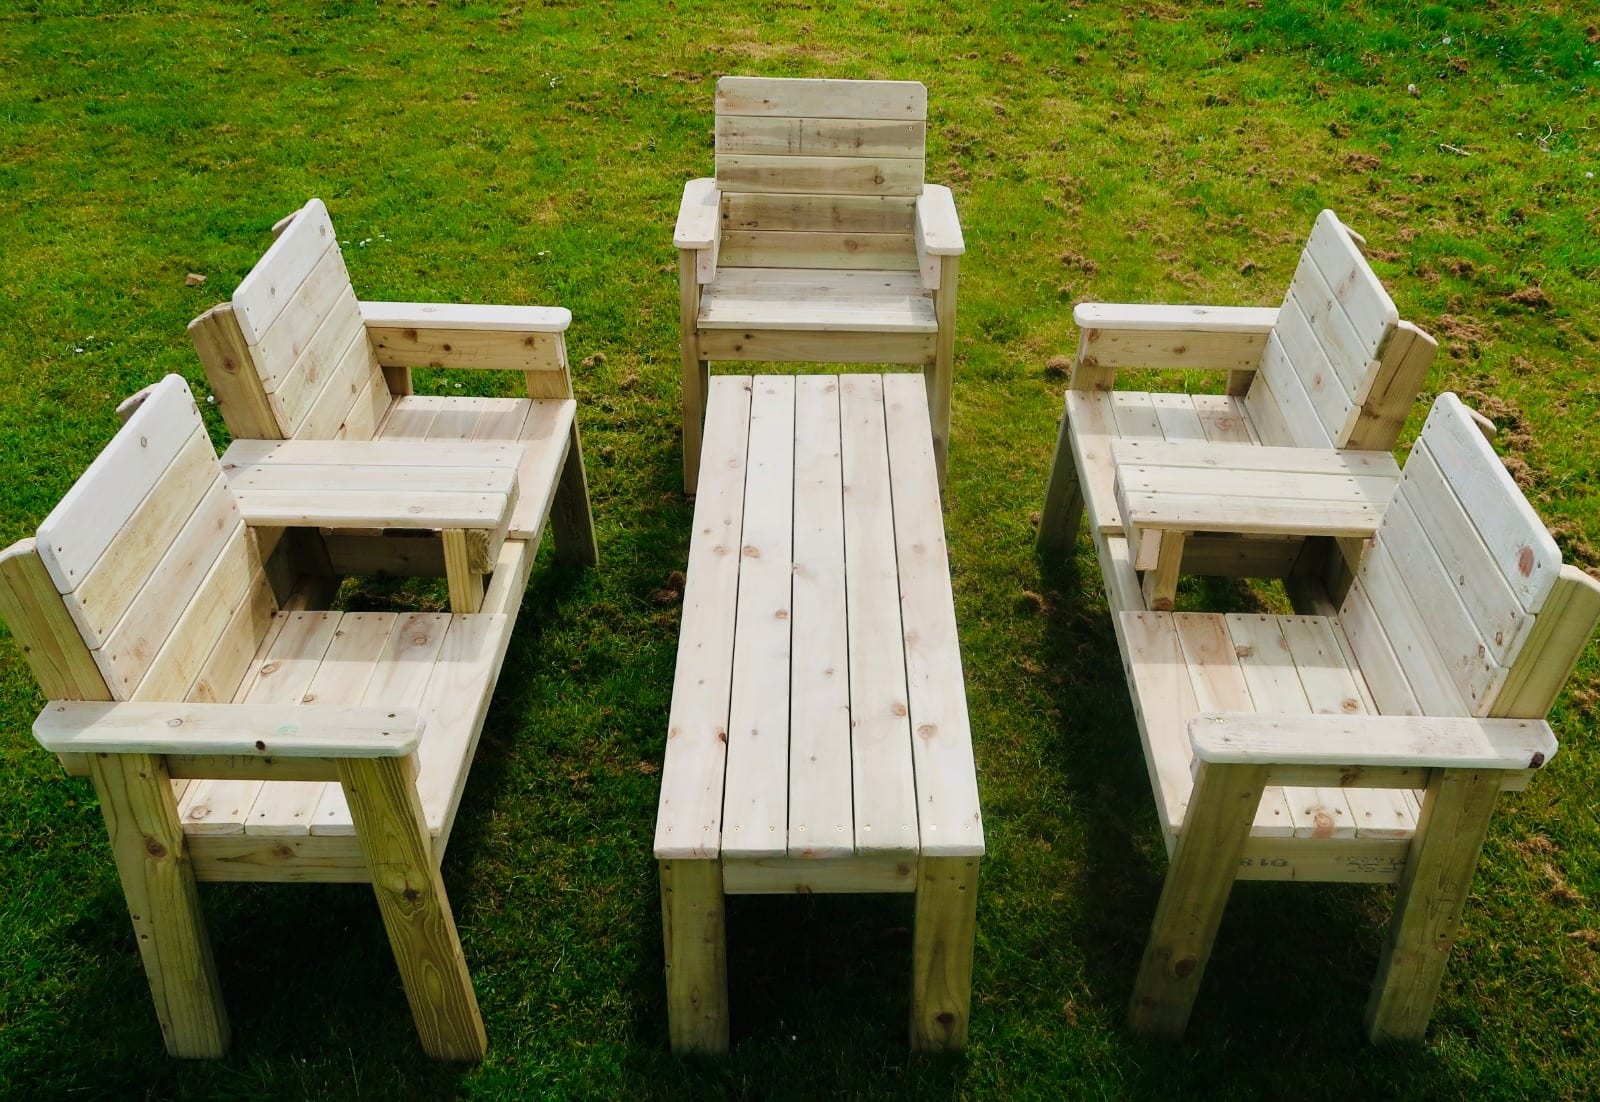 1no table: (L)163cm x (D)50cm x (H)50cm 1no single chair: (D)56cm x (W)72cm x (H) 96cm 2no Love seat: (D)56cm x (W)161cm x (H) 96cm